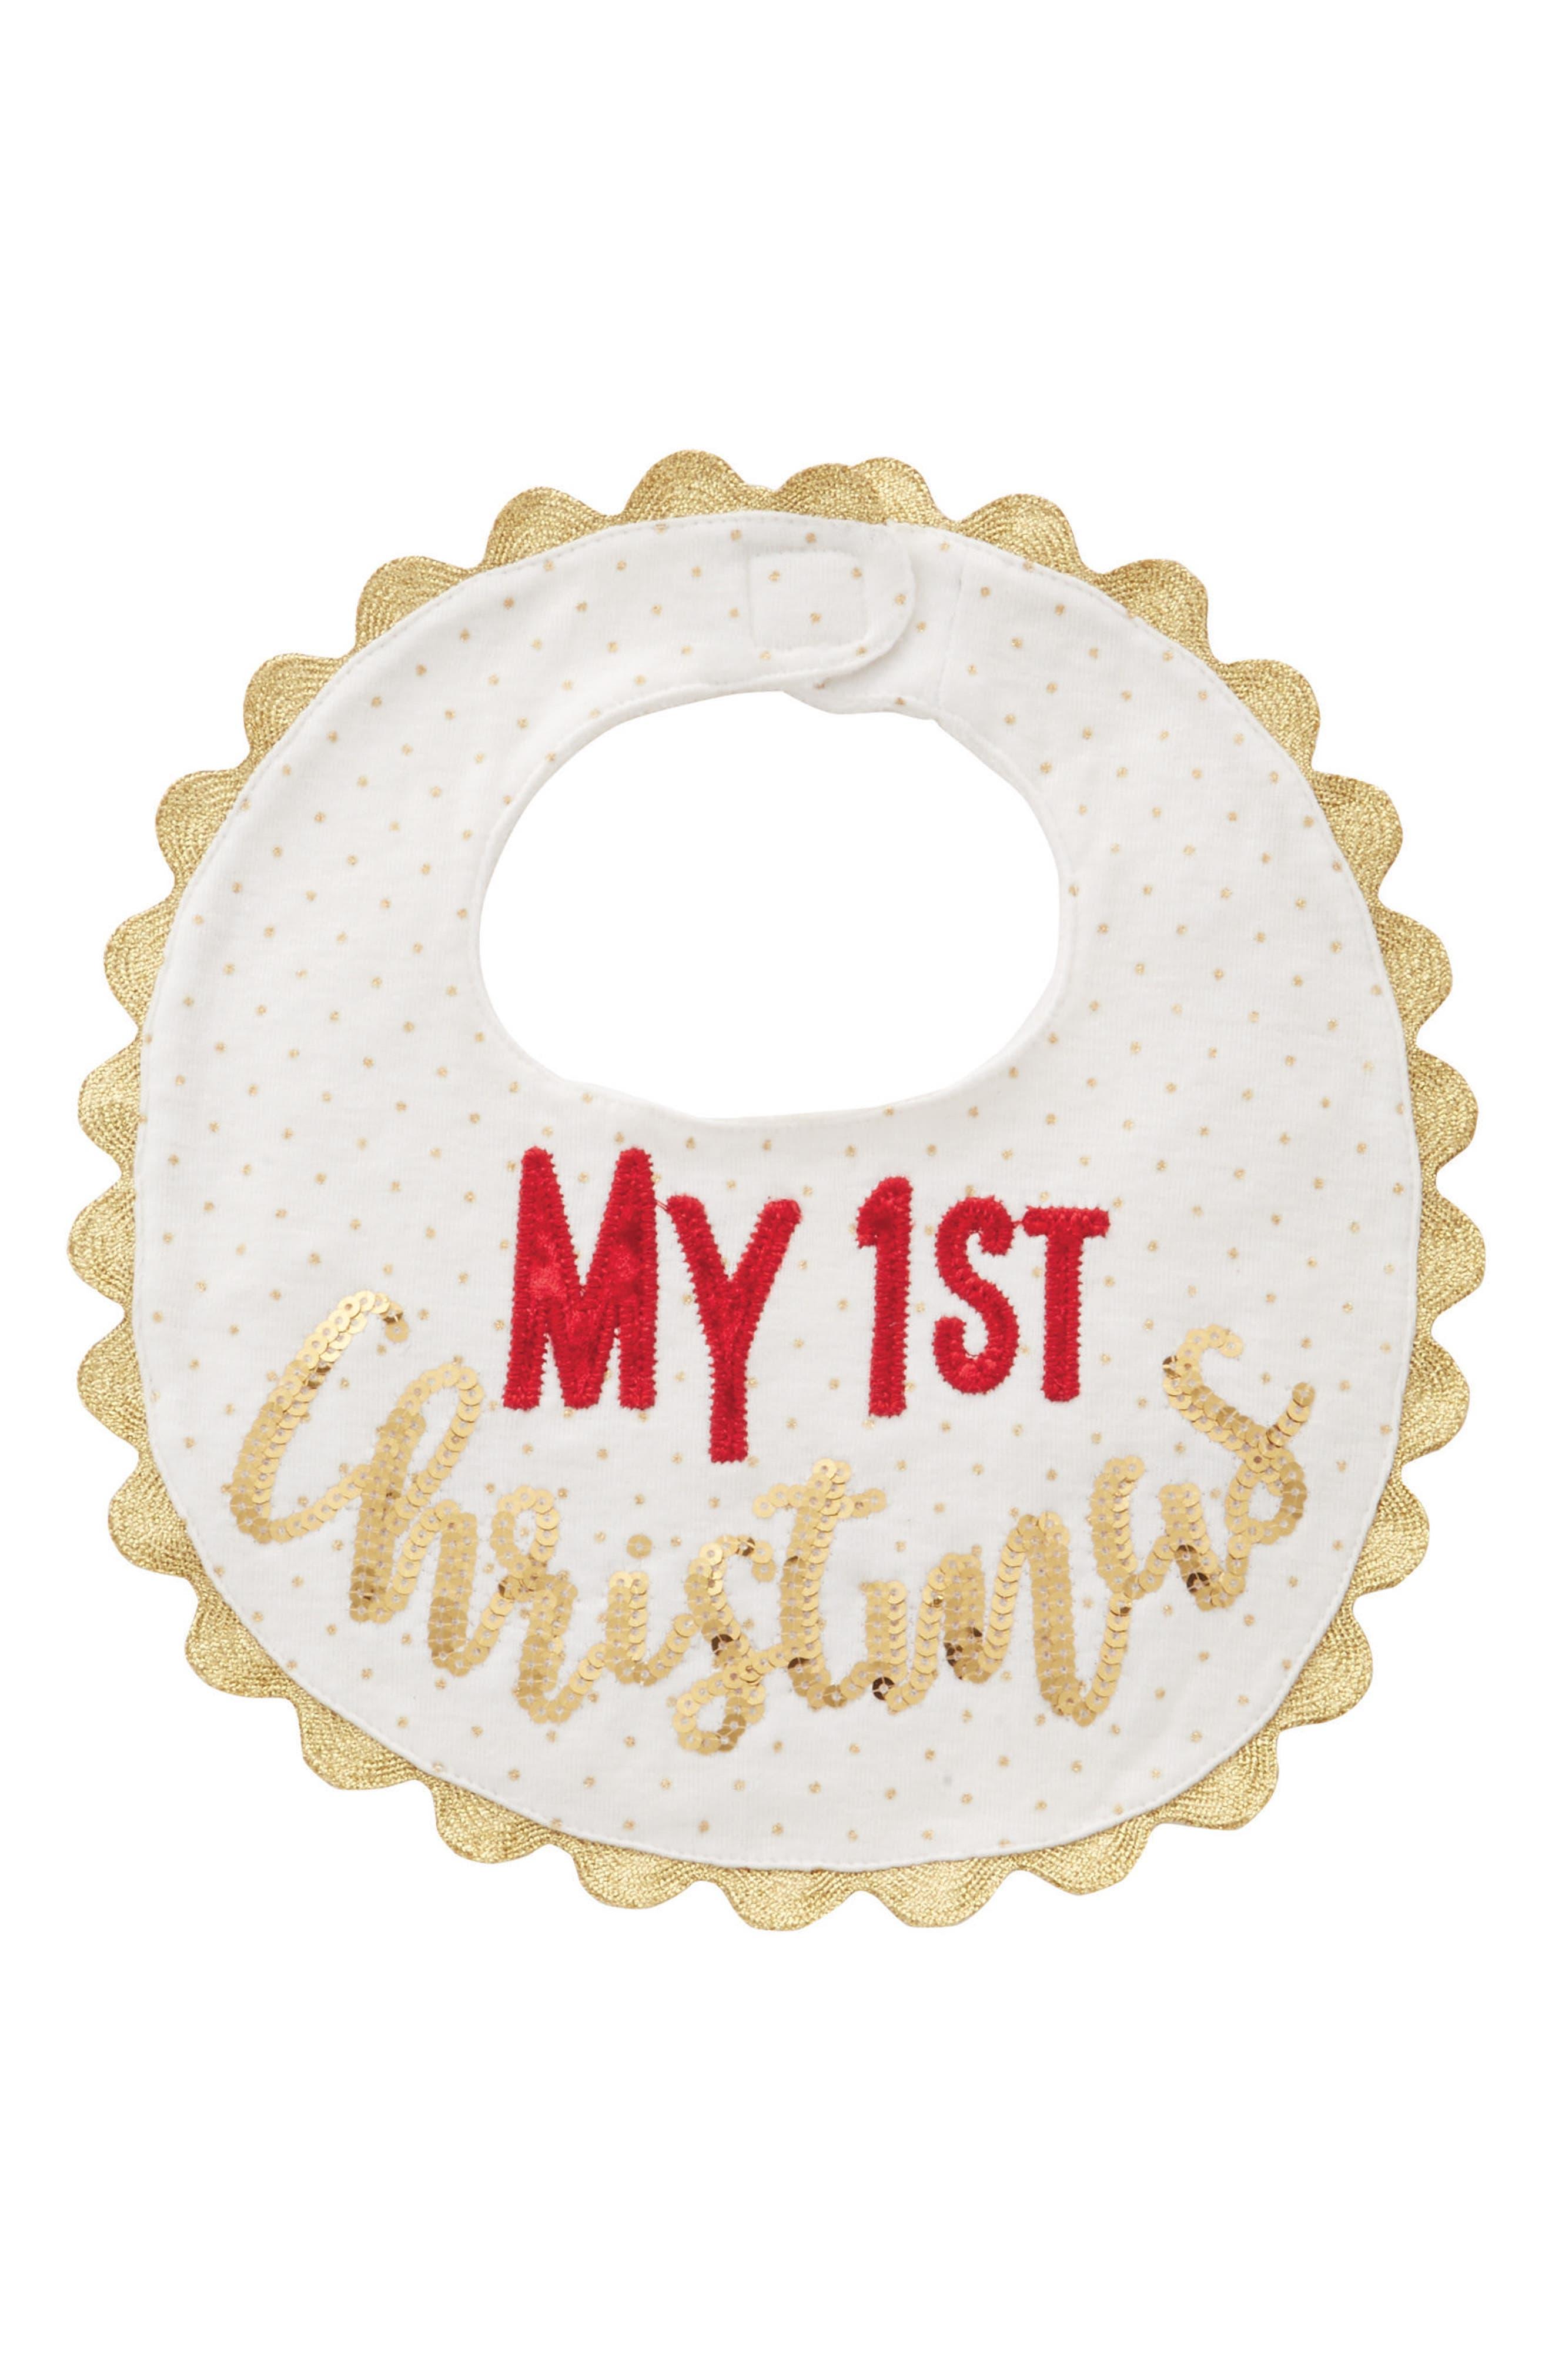 Alternate Image 1 Selected - Mud Pie My First Christmas Bib (Baby)